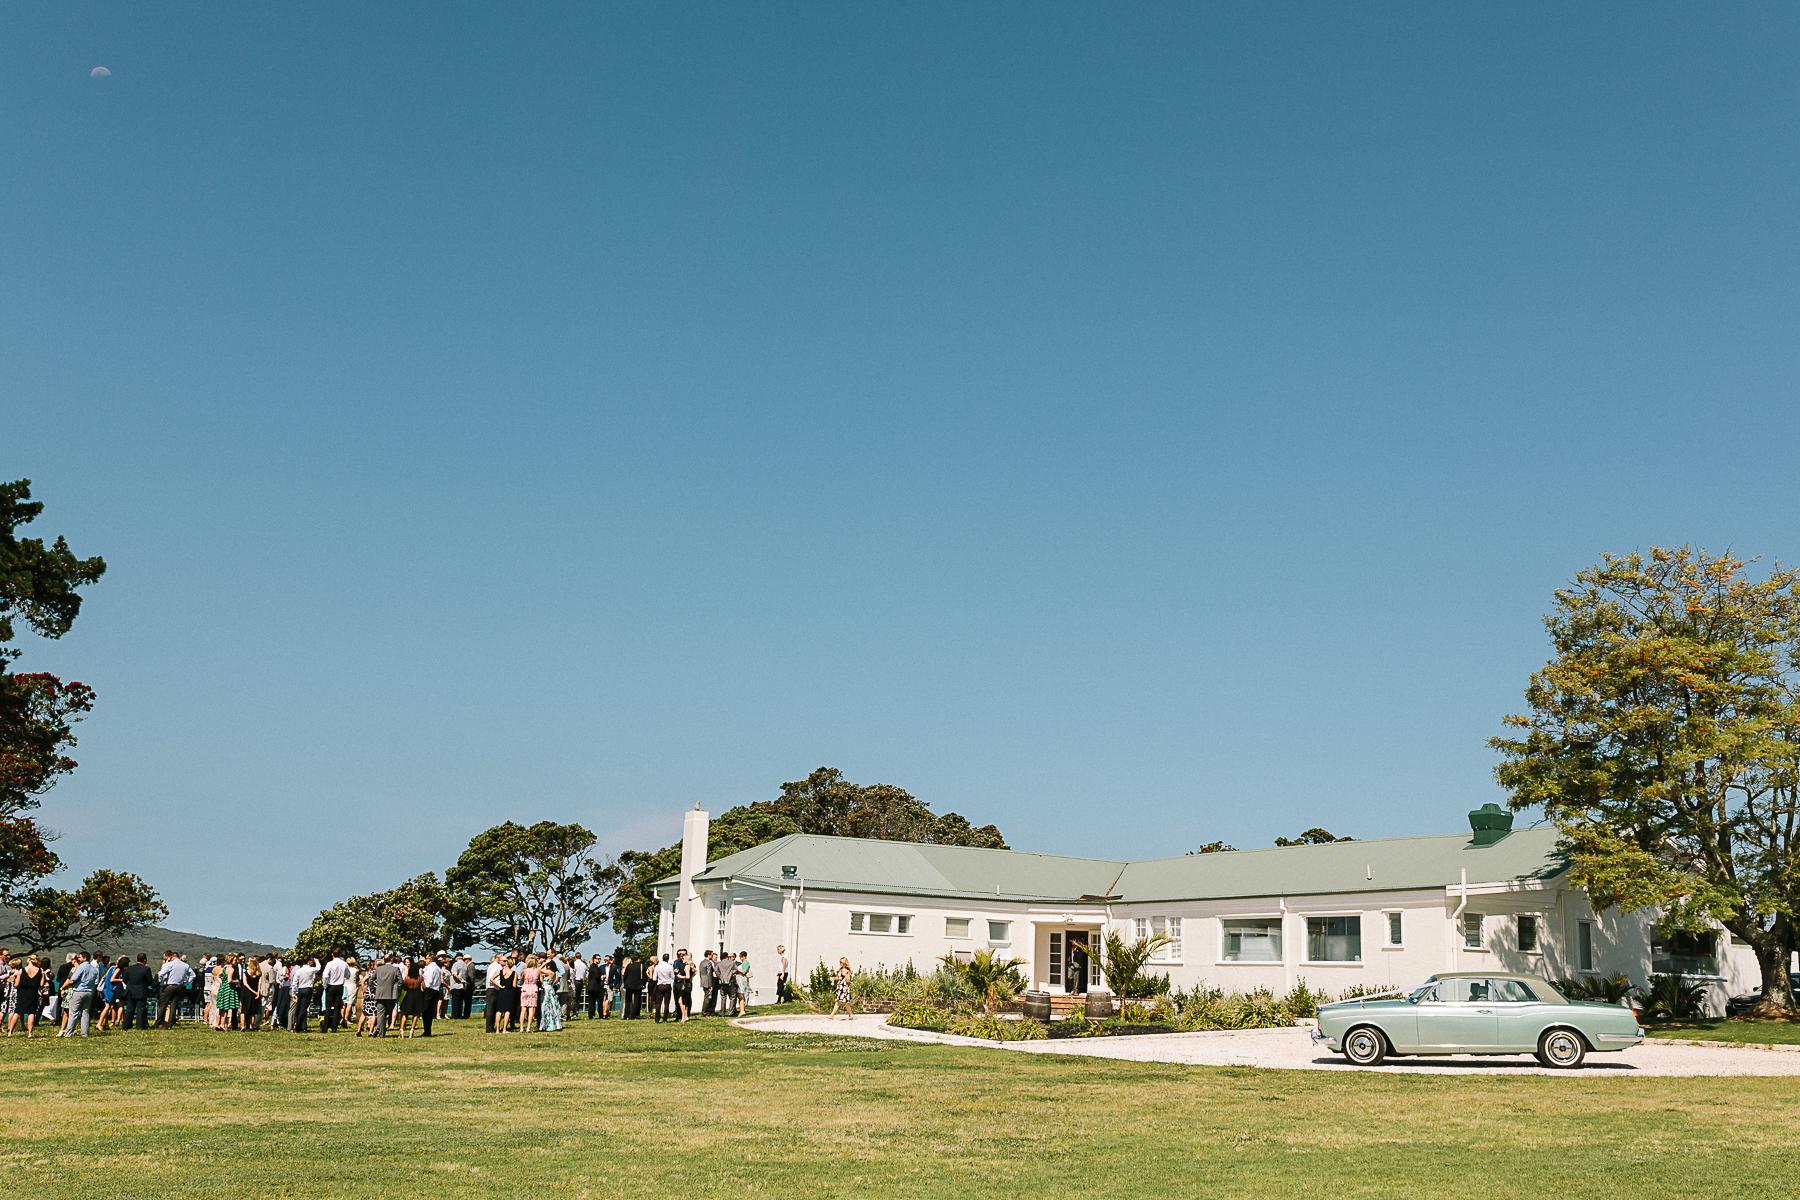 wedding venues near me, auckland, north shore, parnell, ponsonby, grey lynn, remuera